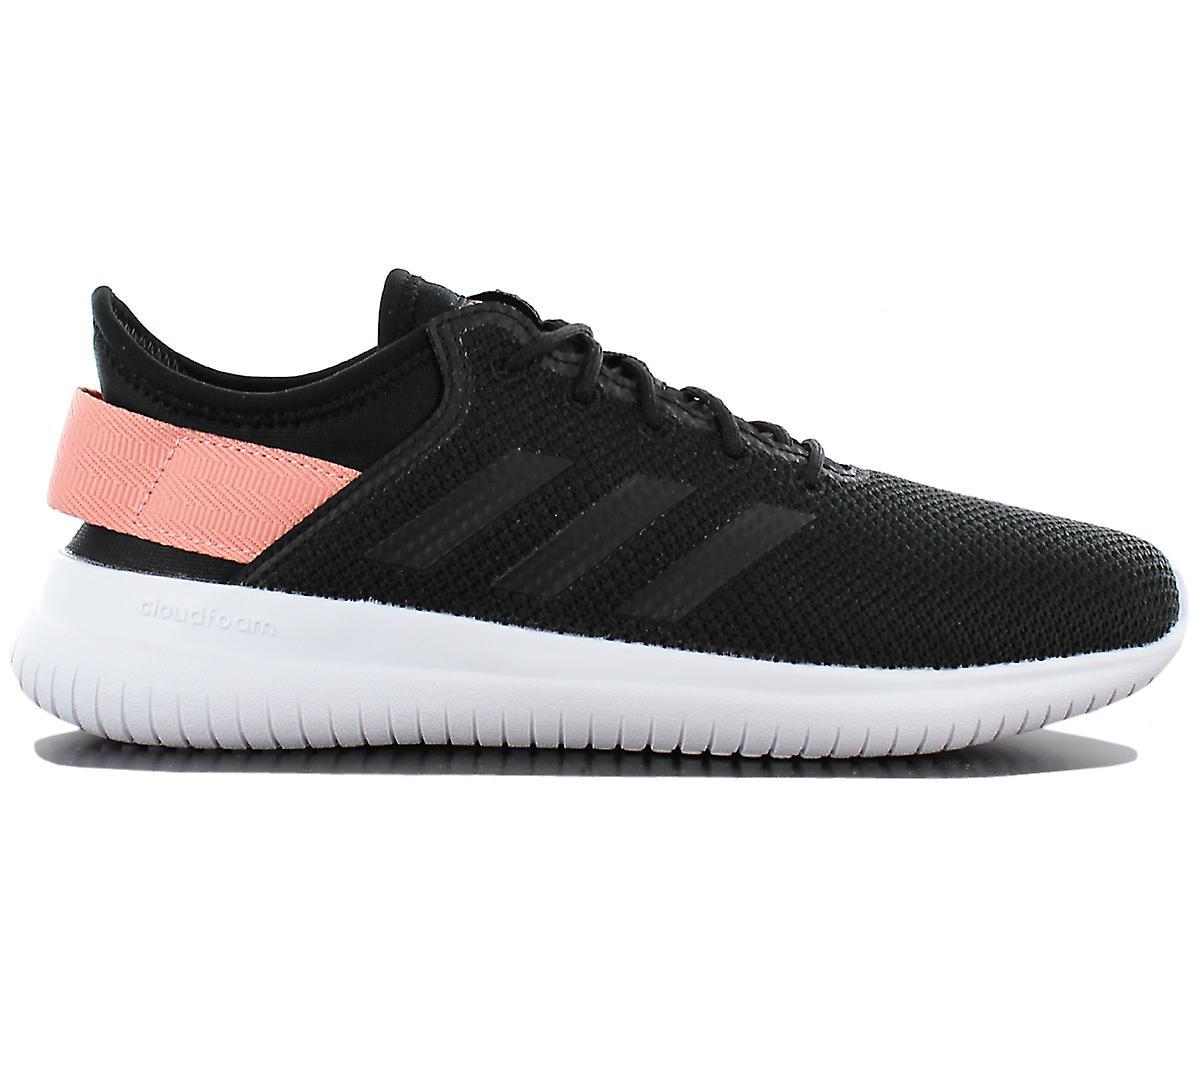 adidas CF Qtflex W AQ1622 Damen Schuhe Schwarz Sneakers Sportschuhe PrW8B